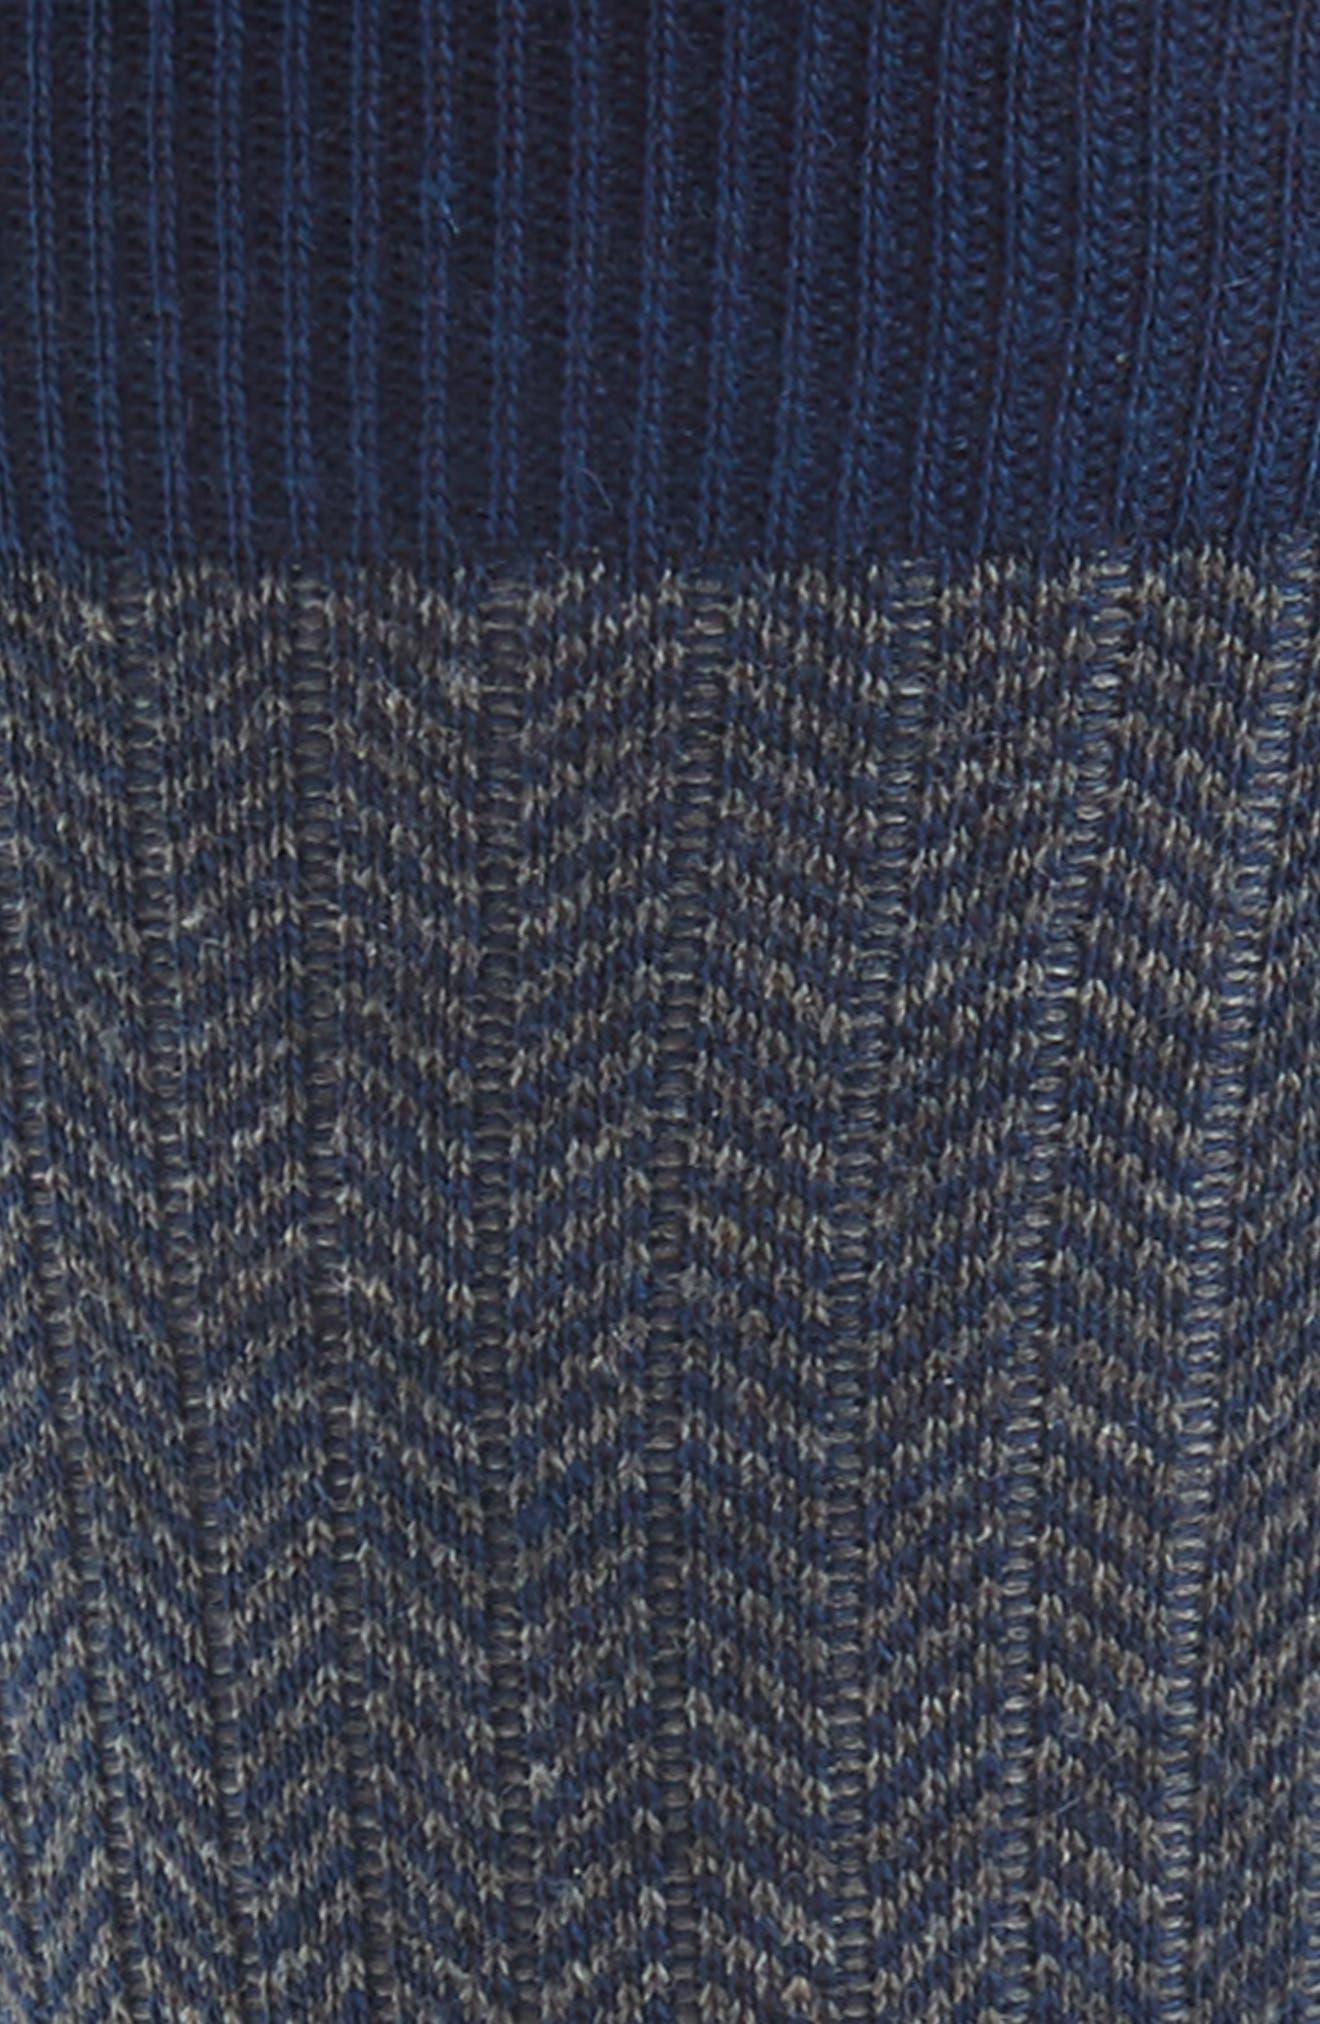 '5911' Mid-Calf Dress Socks,                             Alternate thumbnail 2, color,                             Dark Blue